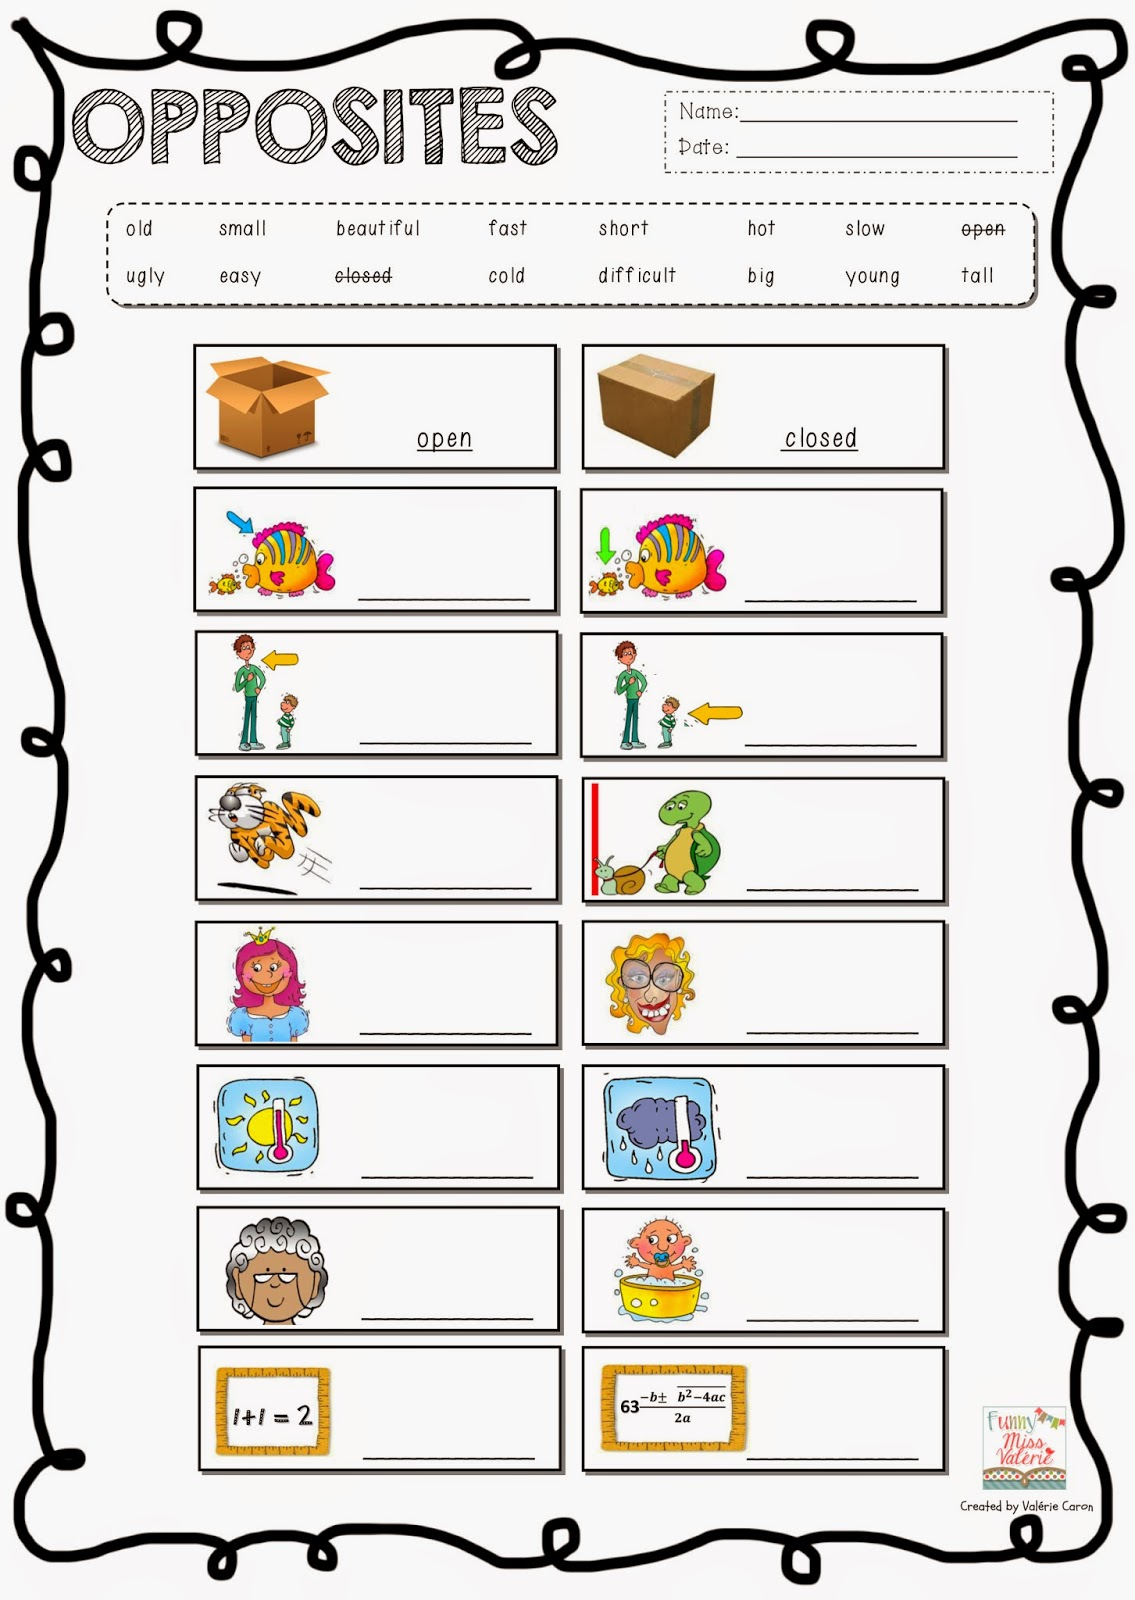 worksheet Opposites Worksheet workbooks preschool opposites worksheets free printable 28 templates for www